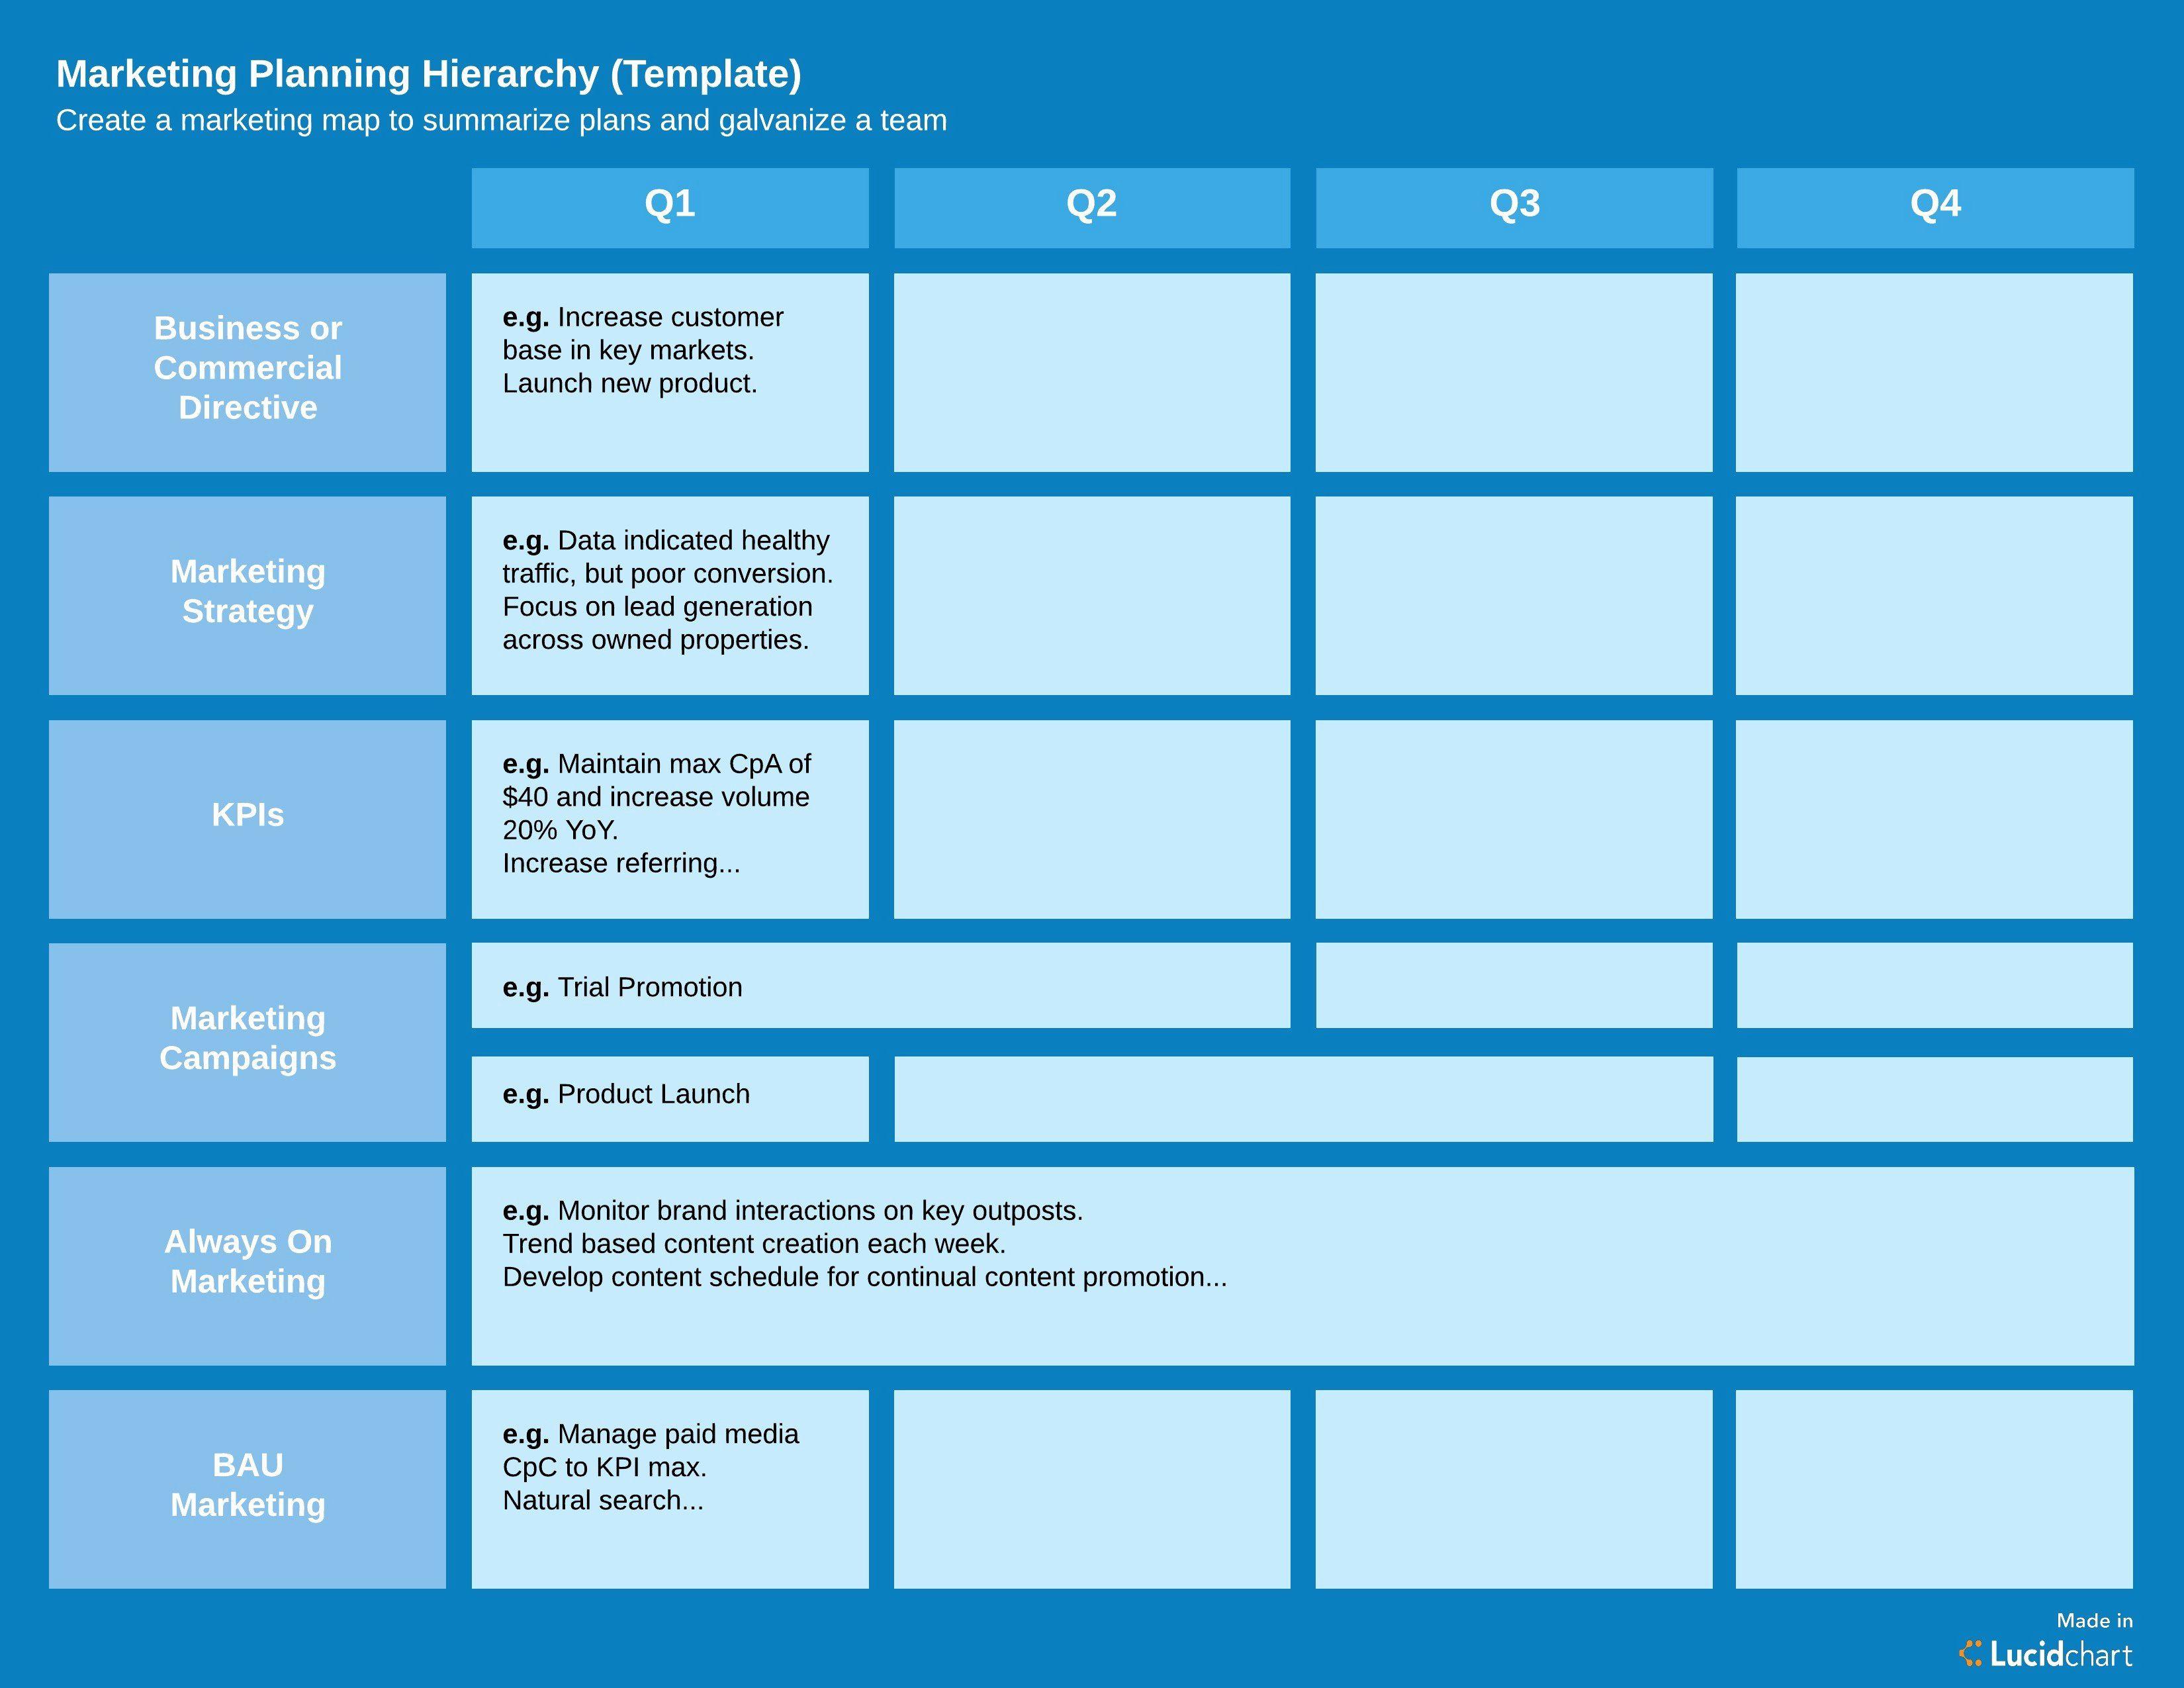 Simple Marketing Plan Template Word Inspirational How To Create A Marketing Plan Templa Marketing Plan Template Business Marketing Plan Template Marketing Plan Sales and marketing plan template